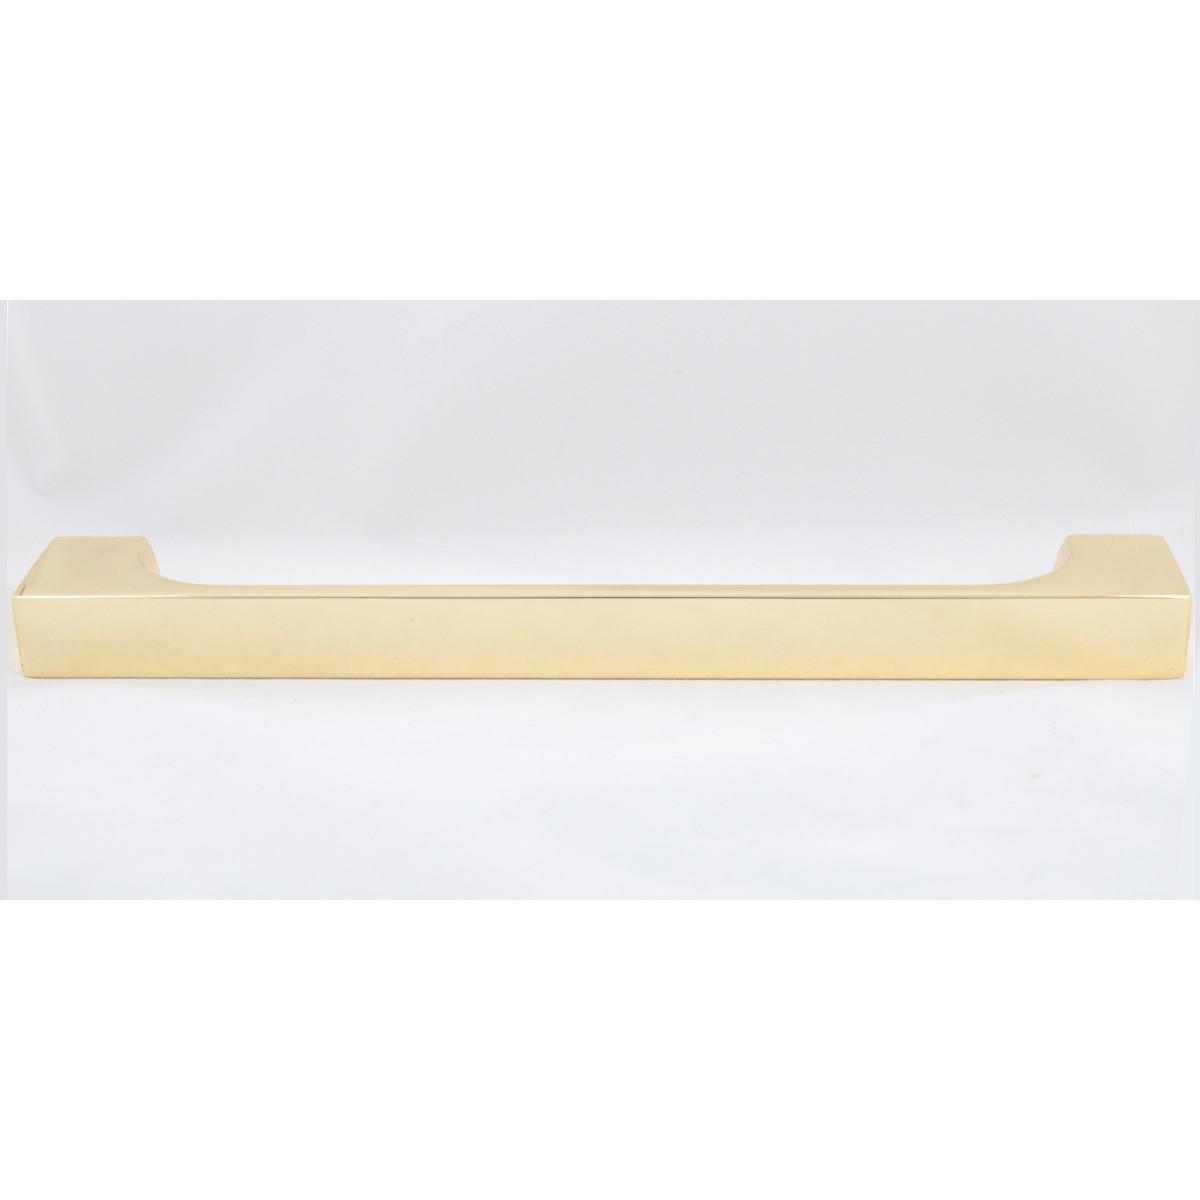 Ручка-Скоба Modda 224 Латунь Золото Pizza-830-09-224